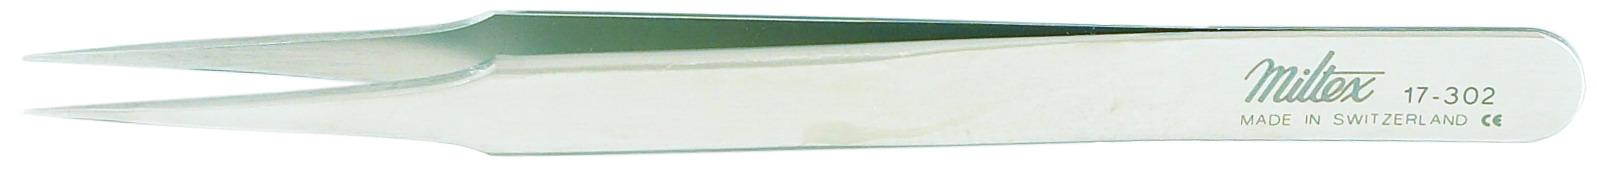 2-swiss-jeweler-fcps-17-302-miltex.jpg